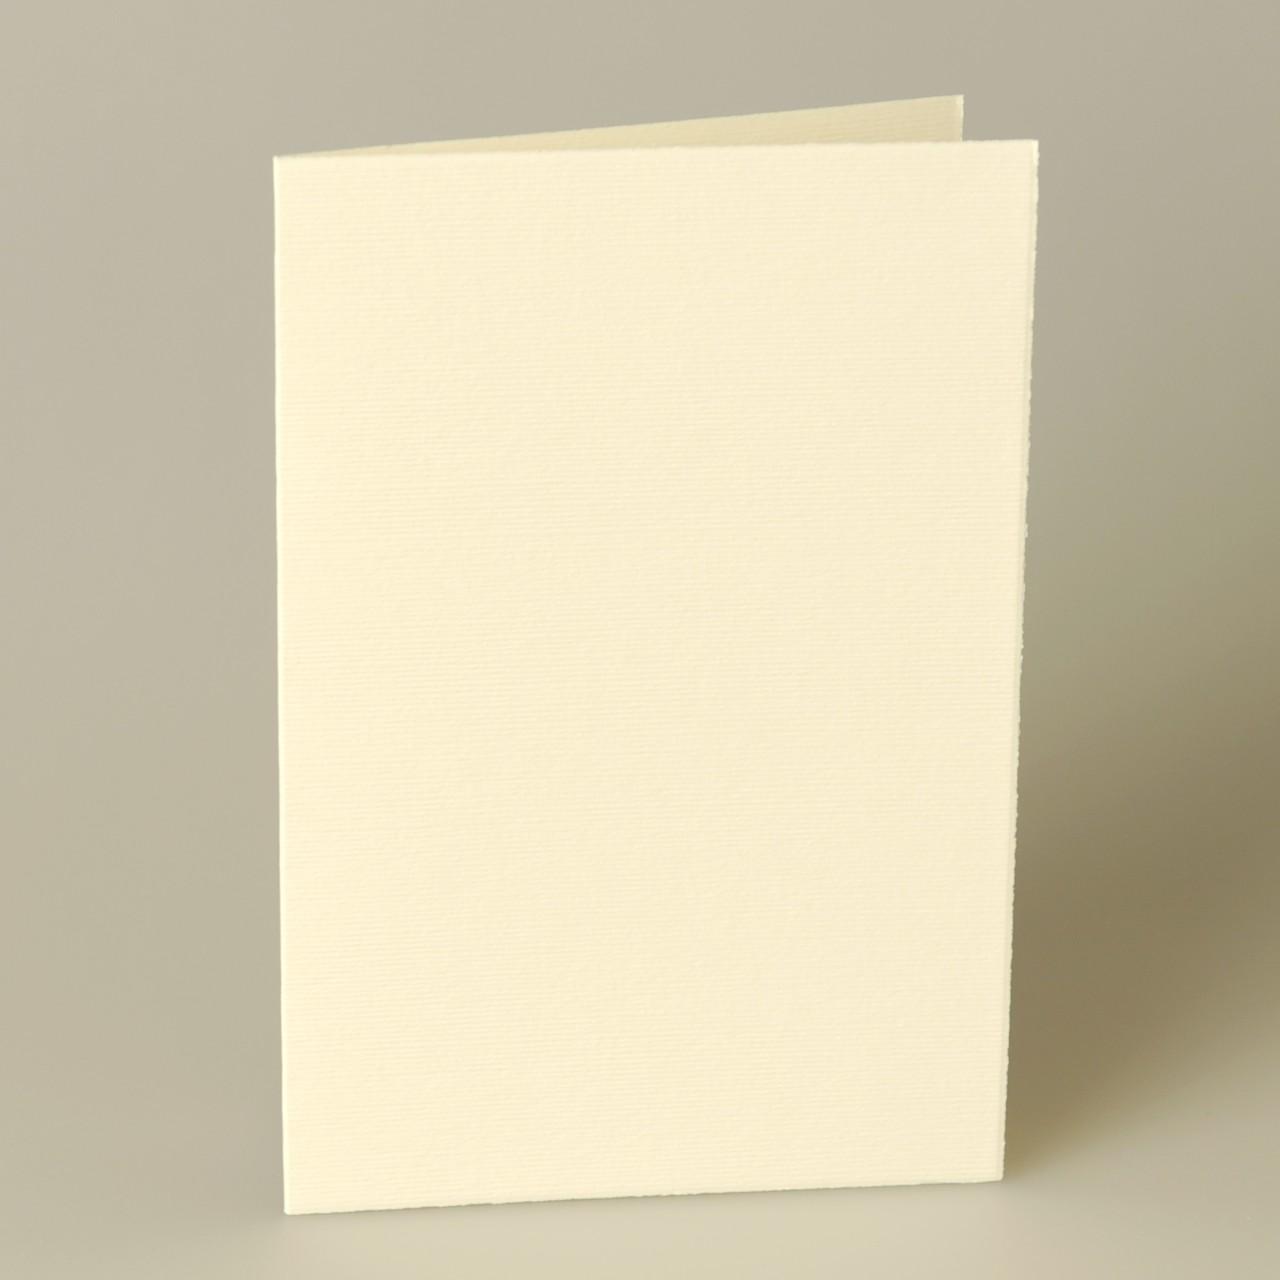 Blancokarte - B 3793